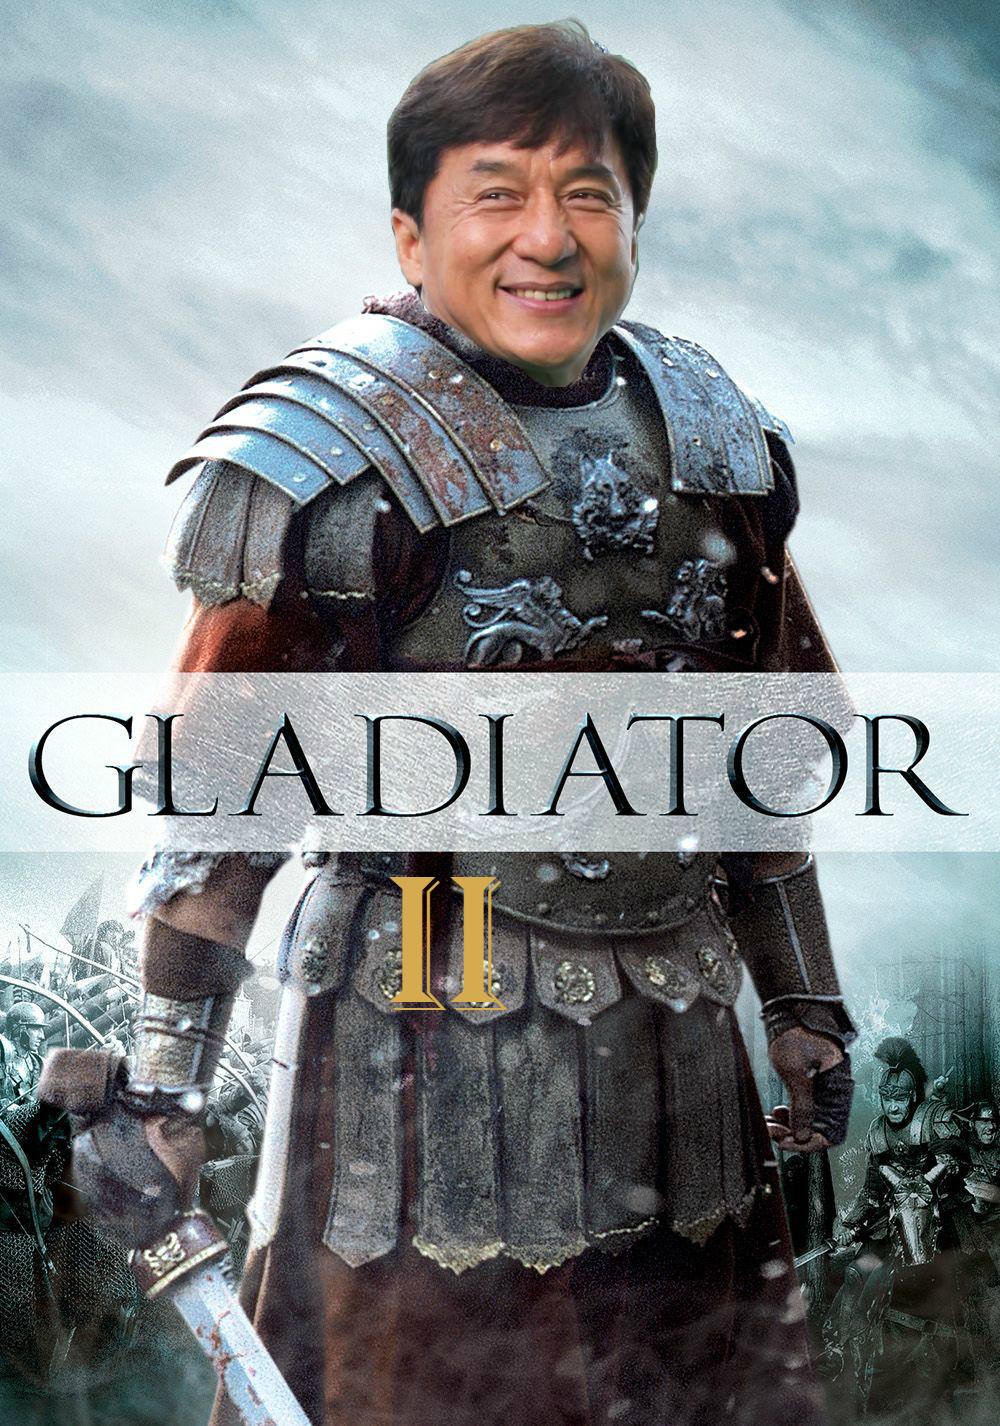 Gladiator II Poster.png